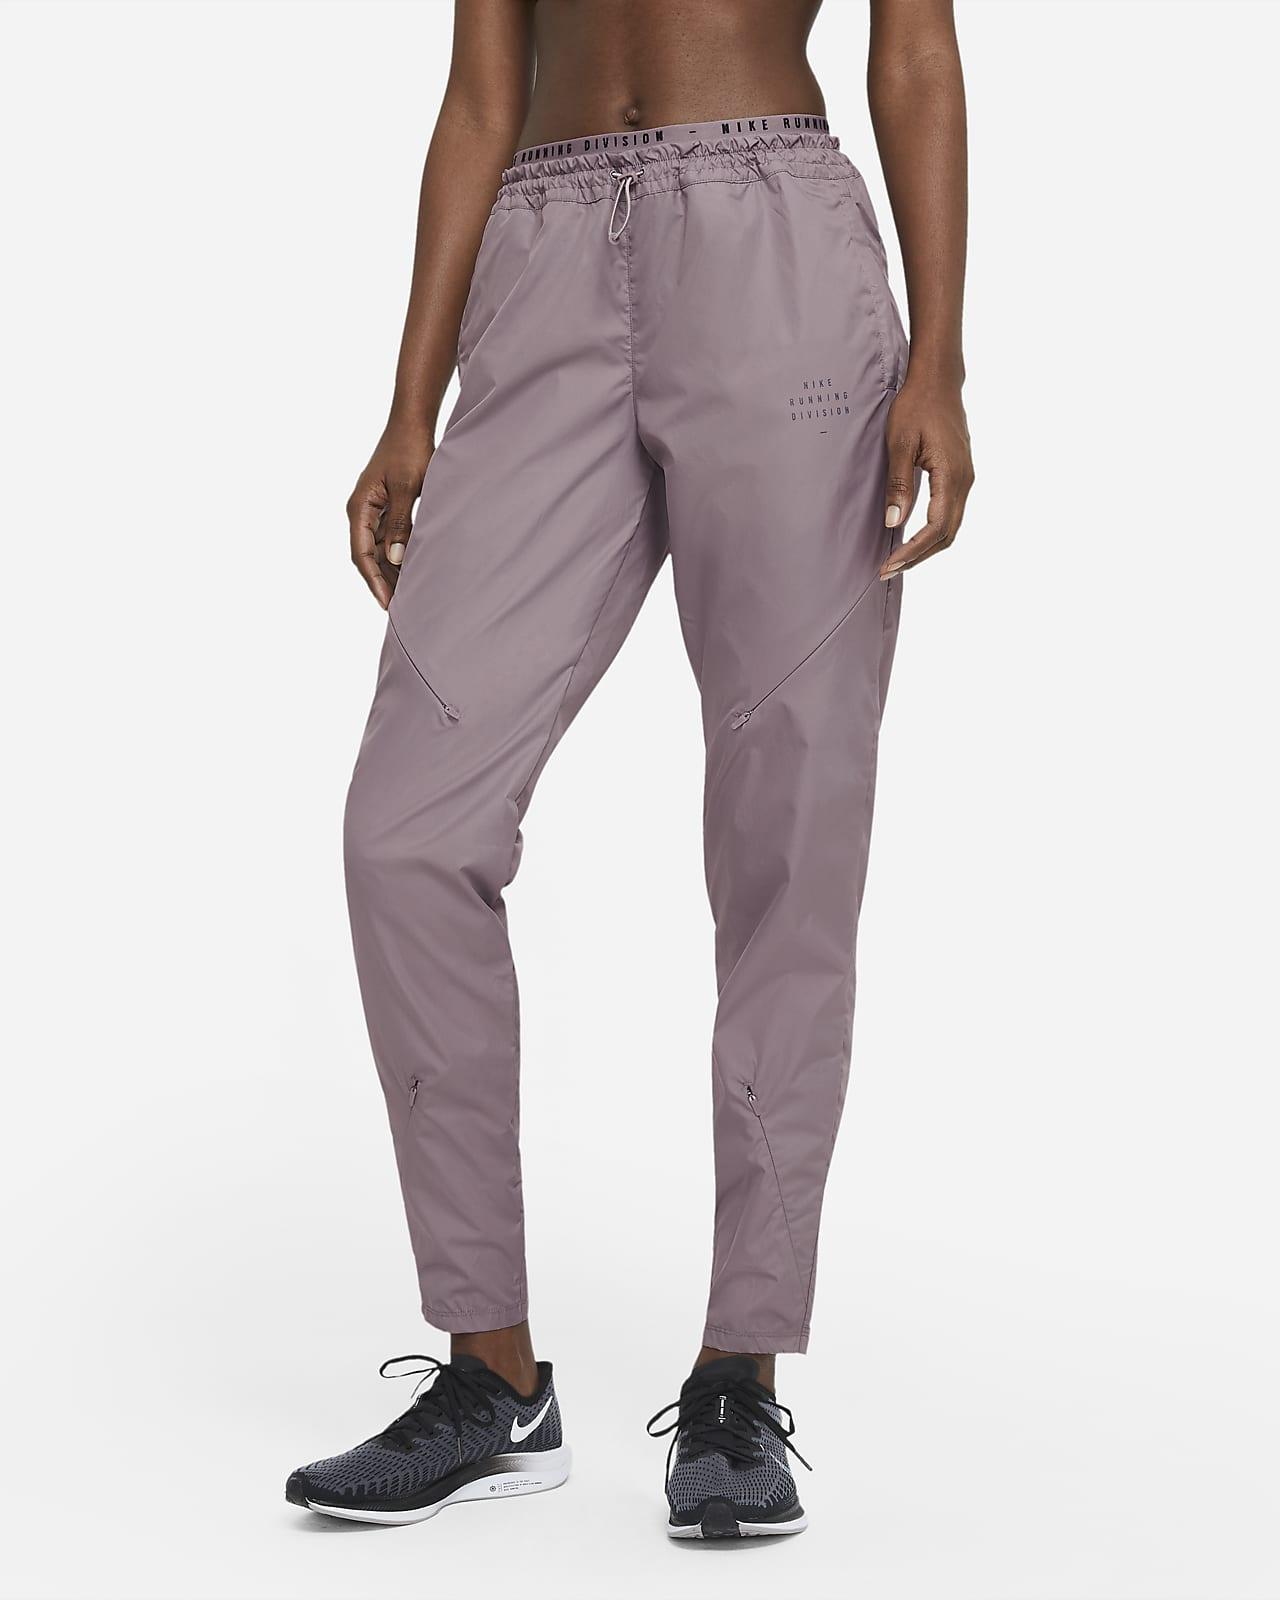 Nike Run Division Women's Dynamic Vent Running Pants